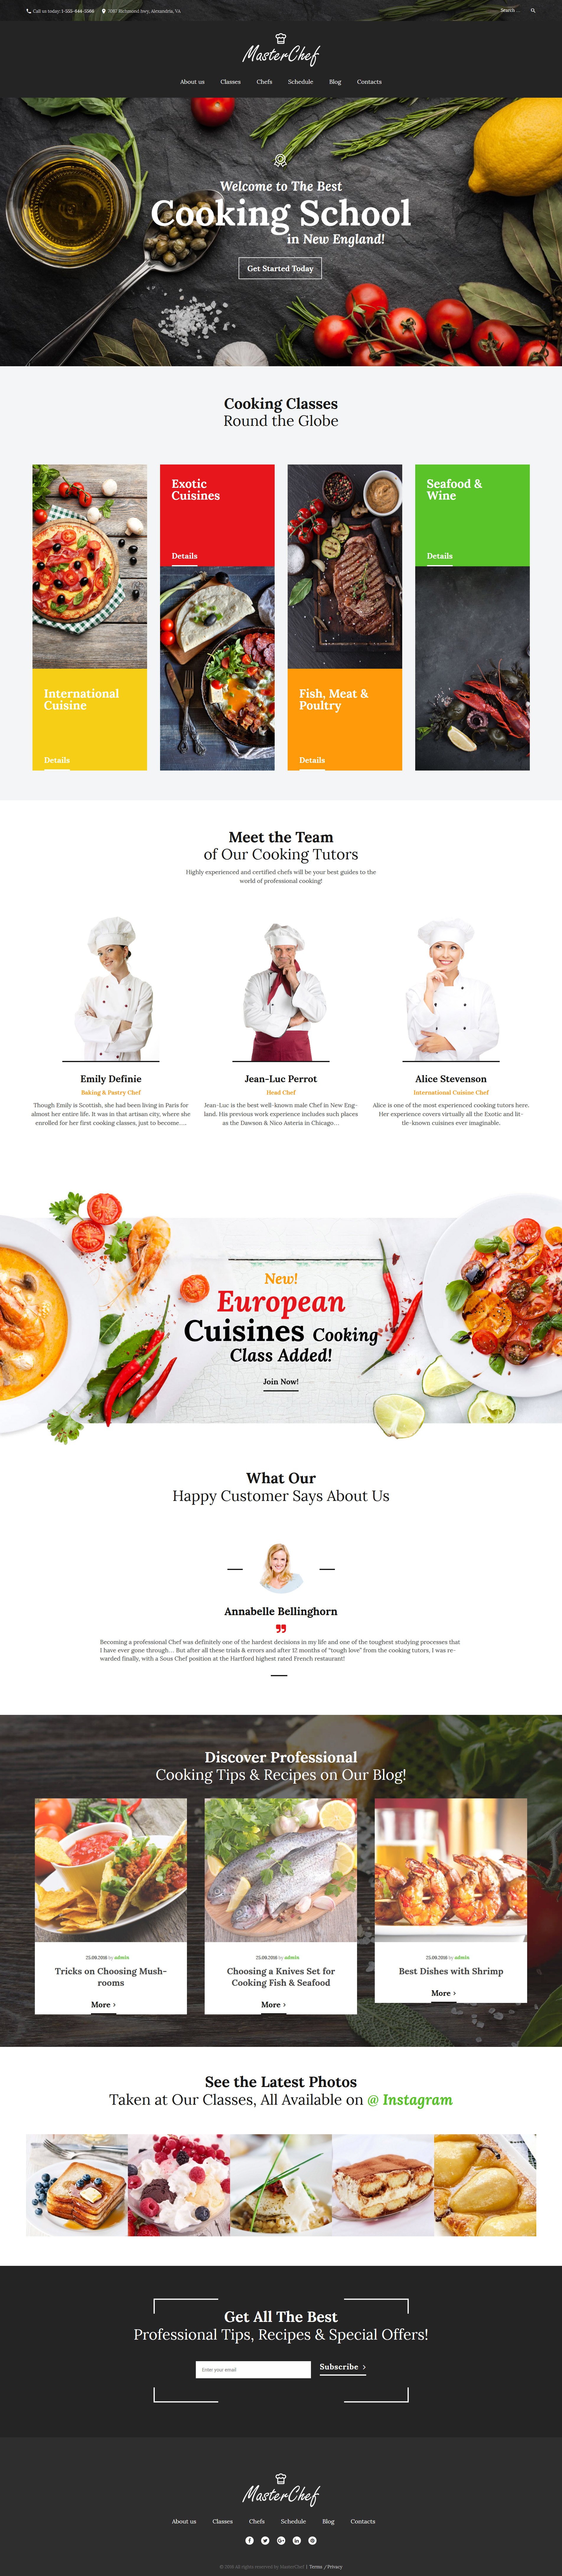 Адаптивный шаблон сайта на тему кулинарная школа #59011